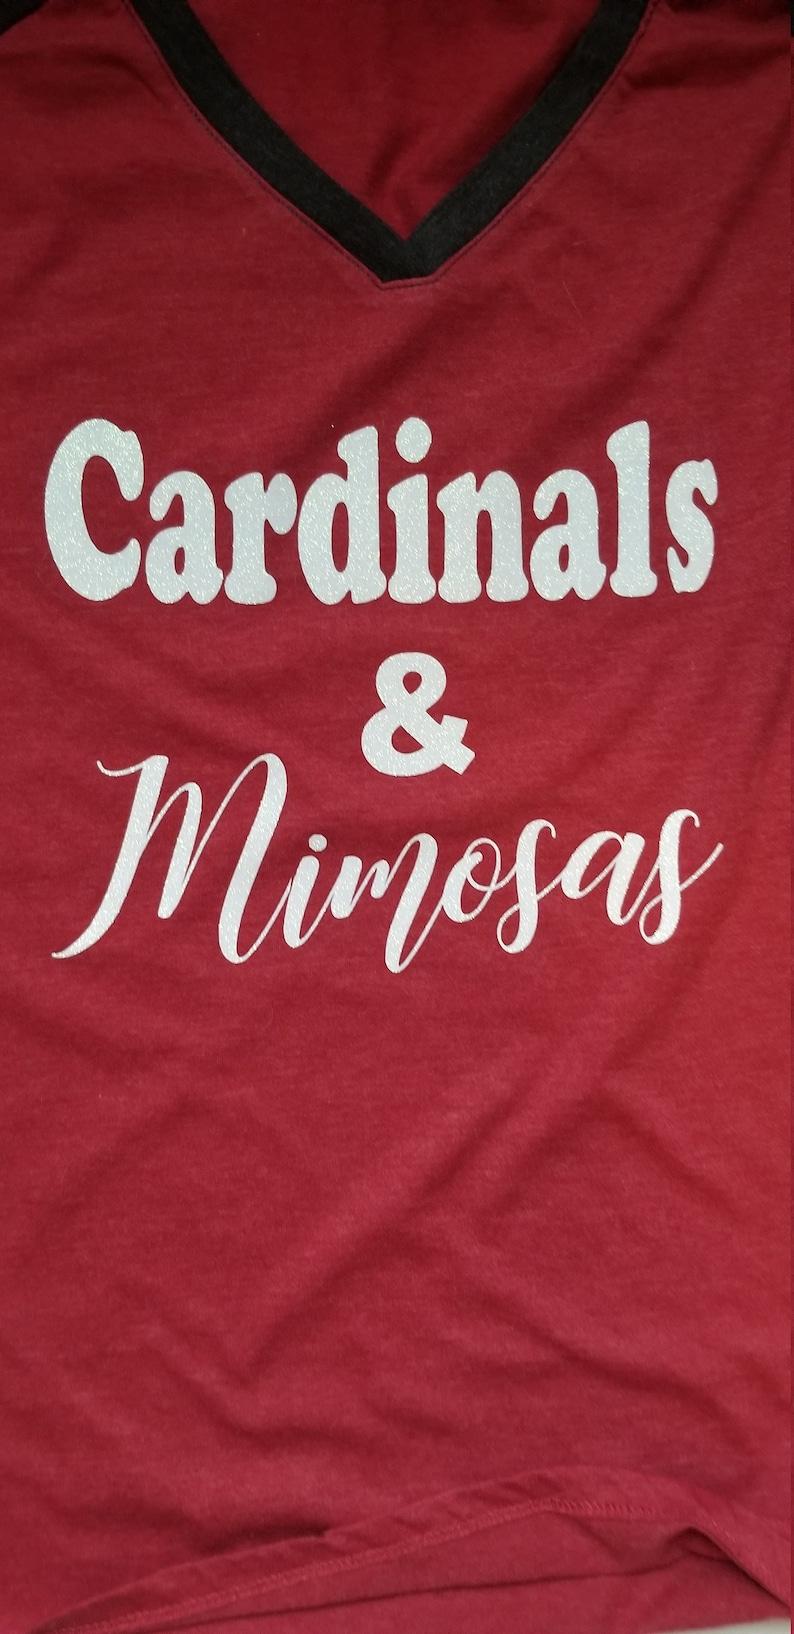 new arrival fa858 918b4 AZ Cardinals shirt, Bling Cardinals Shirt, Cardinals and Mimosas Shirt. NFL  Shirt